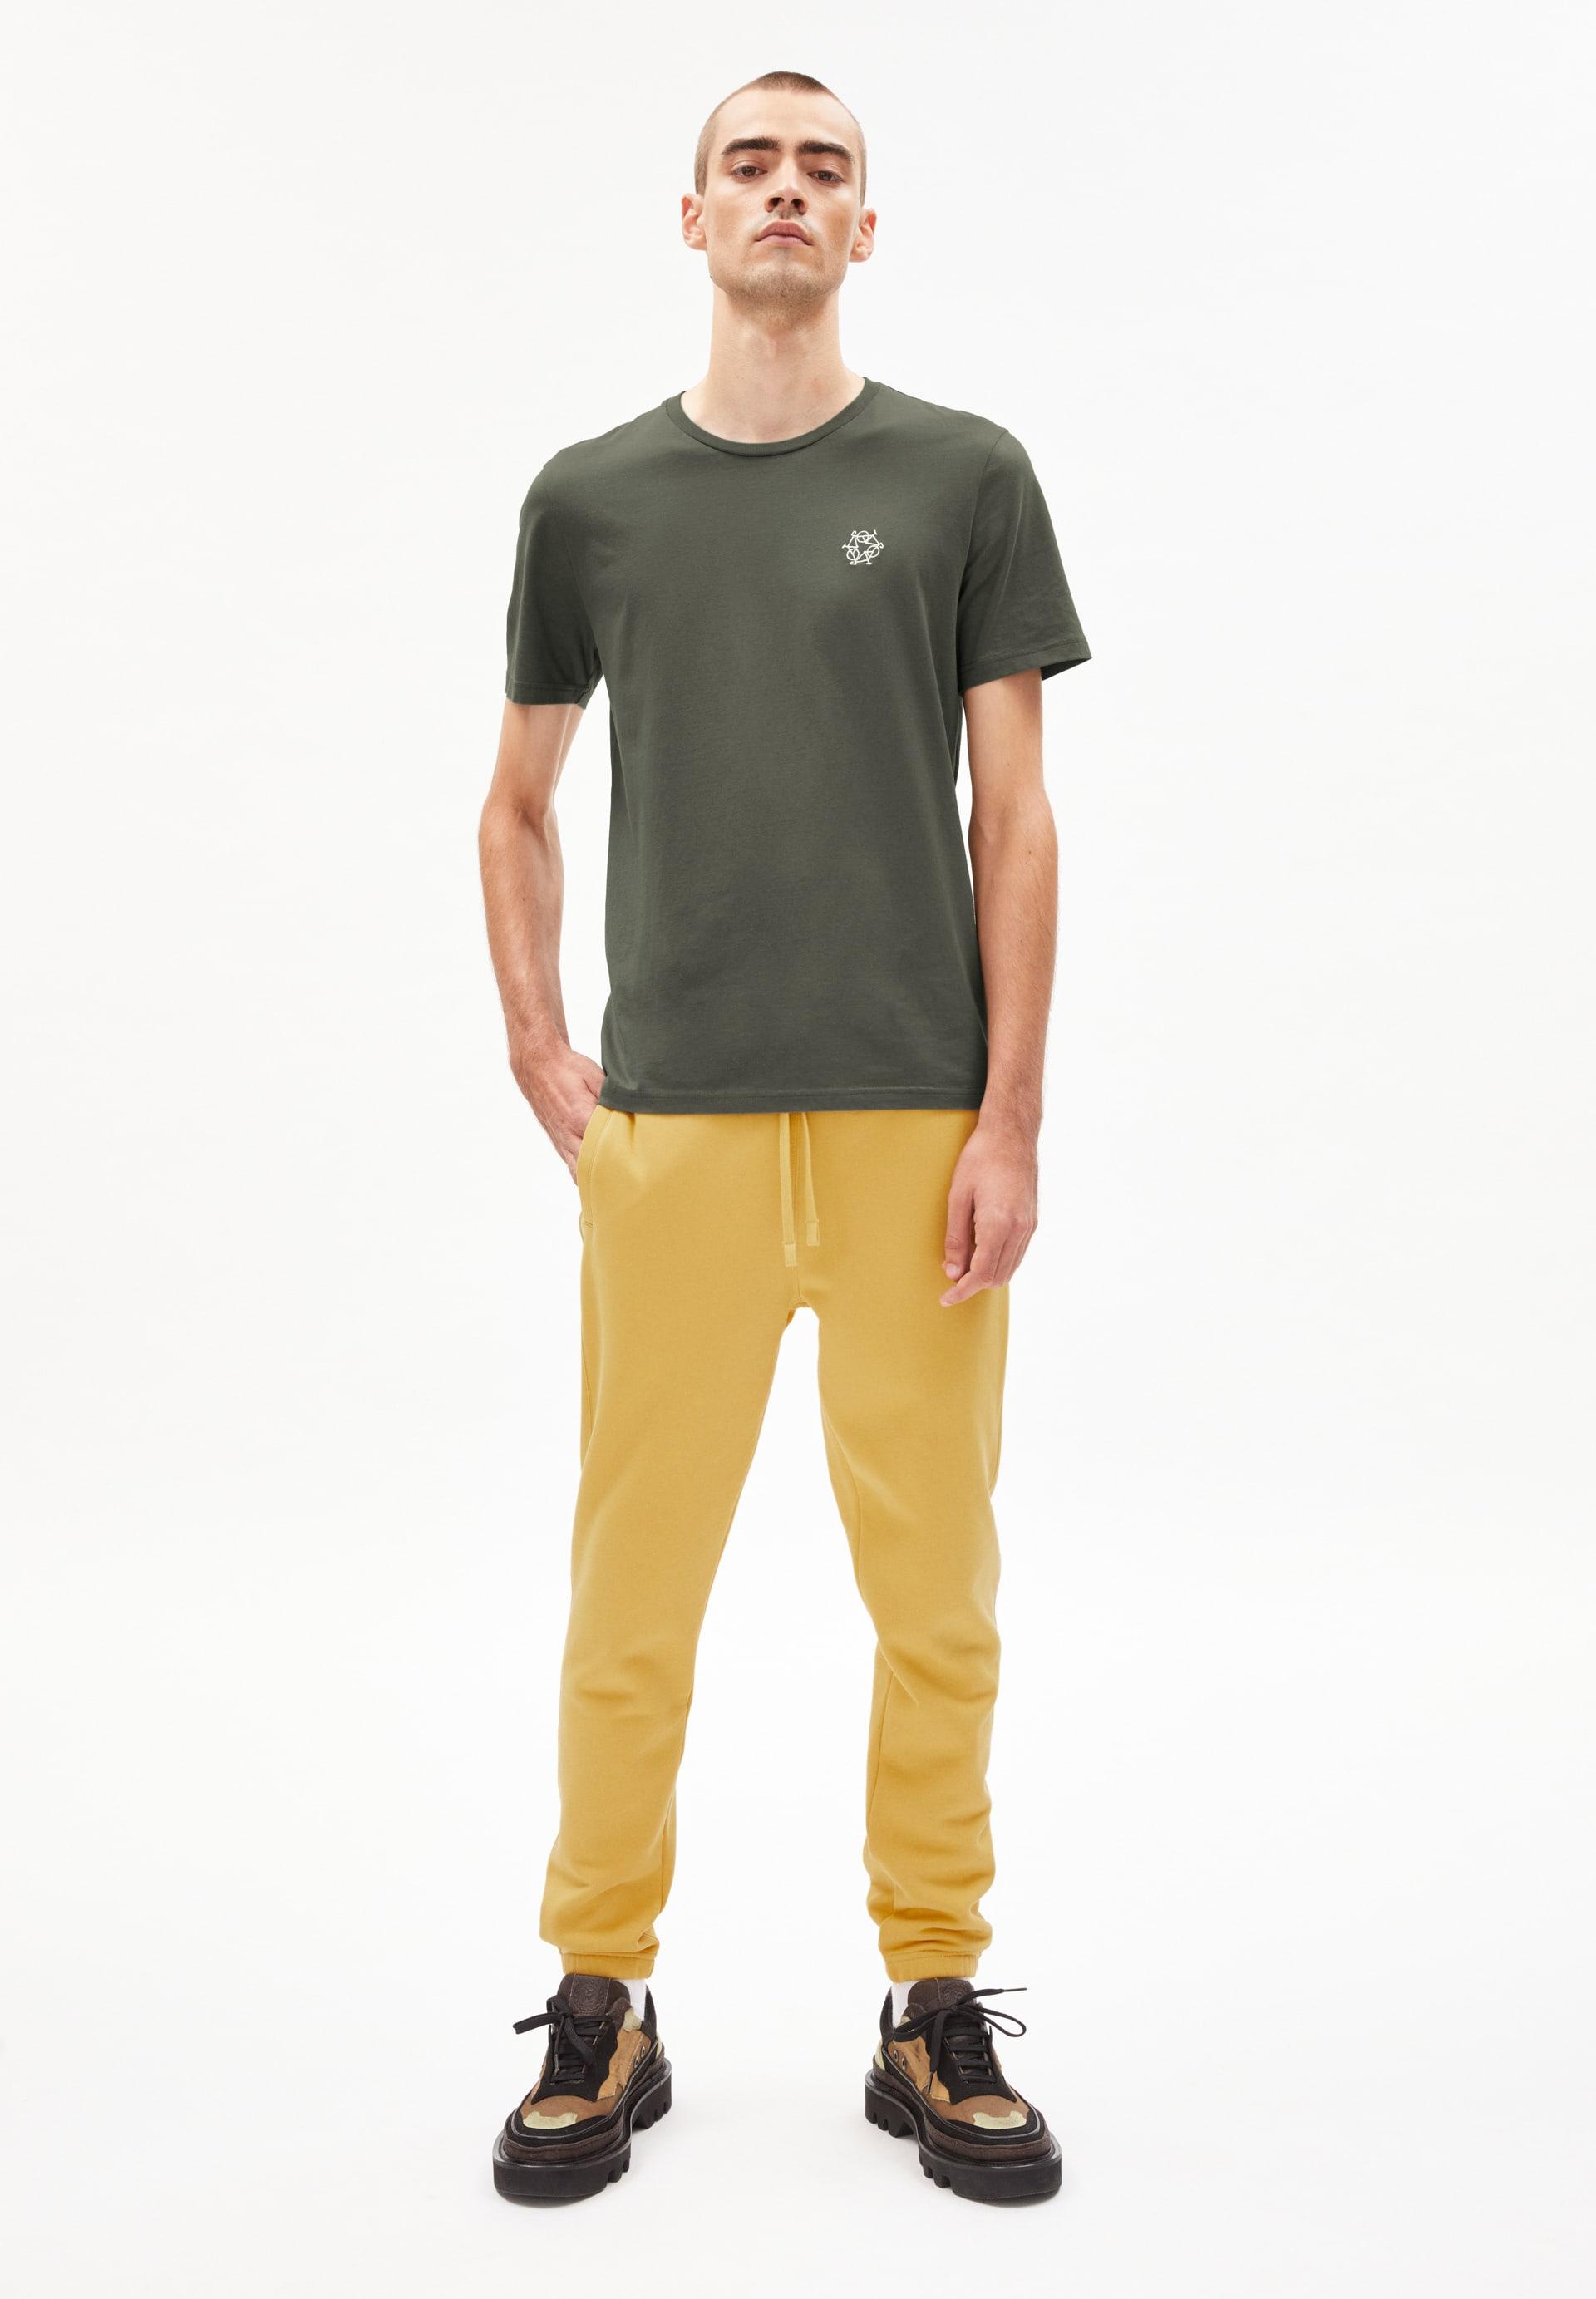 AADAN COMFORT Sweat Pants made of Organic Cotton